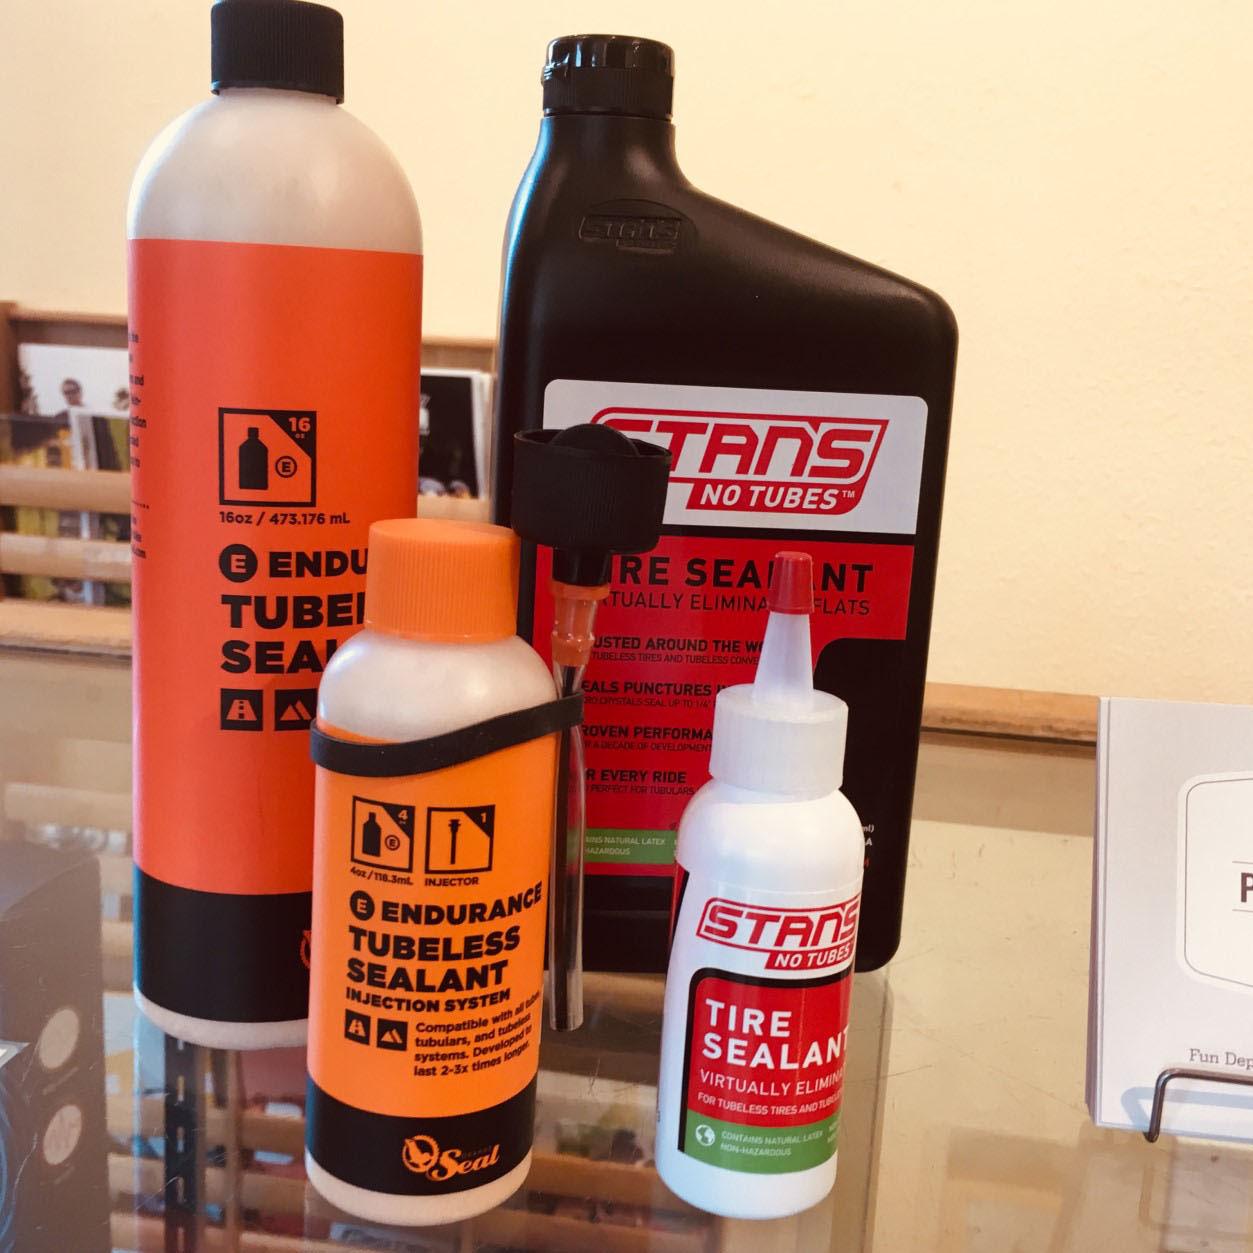 Stans No Tubes and Endurance tubeless tire sealants